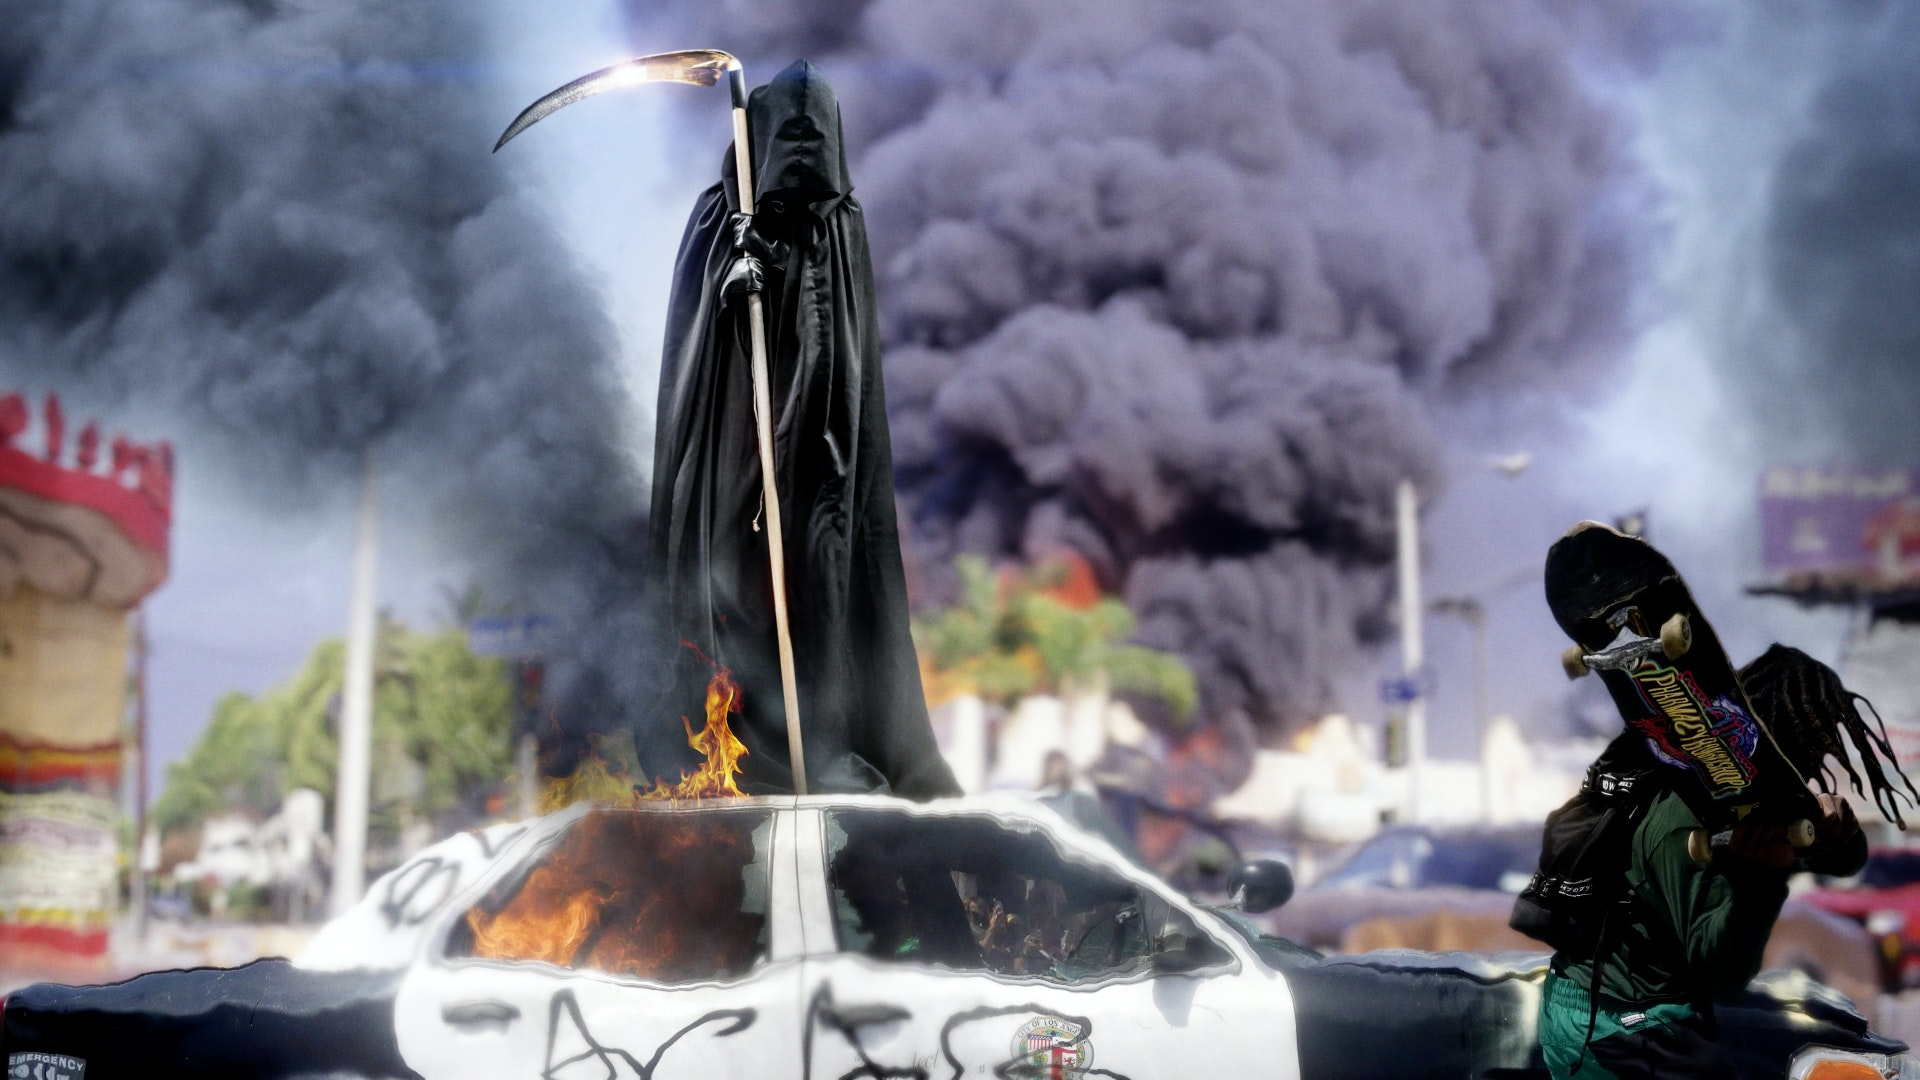 Ep. 1242 - Trashing The Cops Gets Black Americans Killed